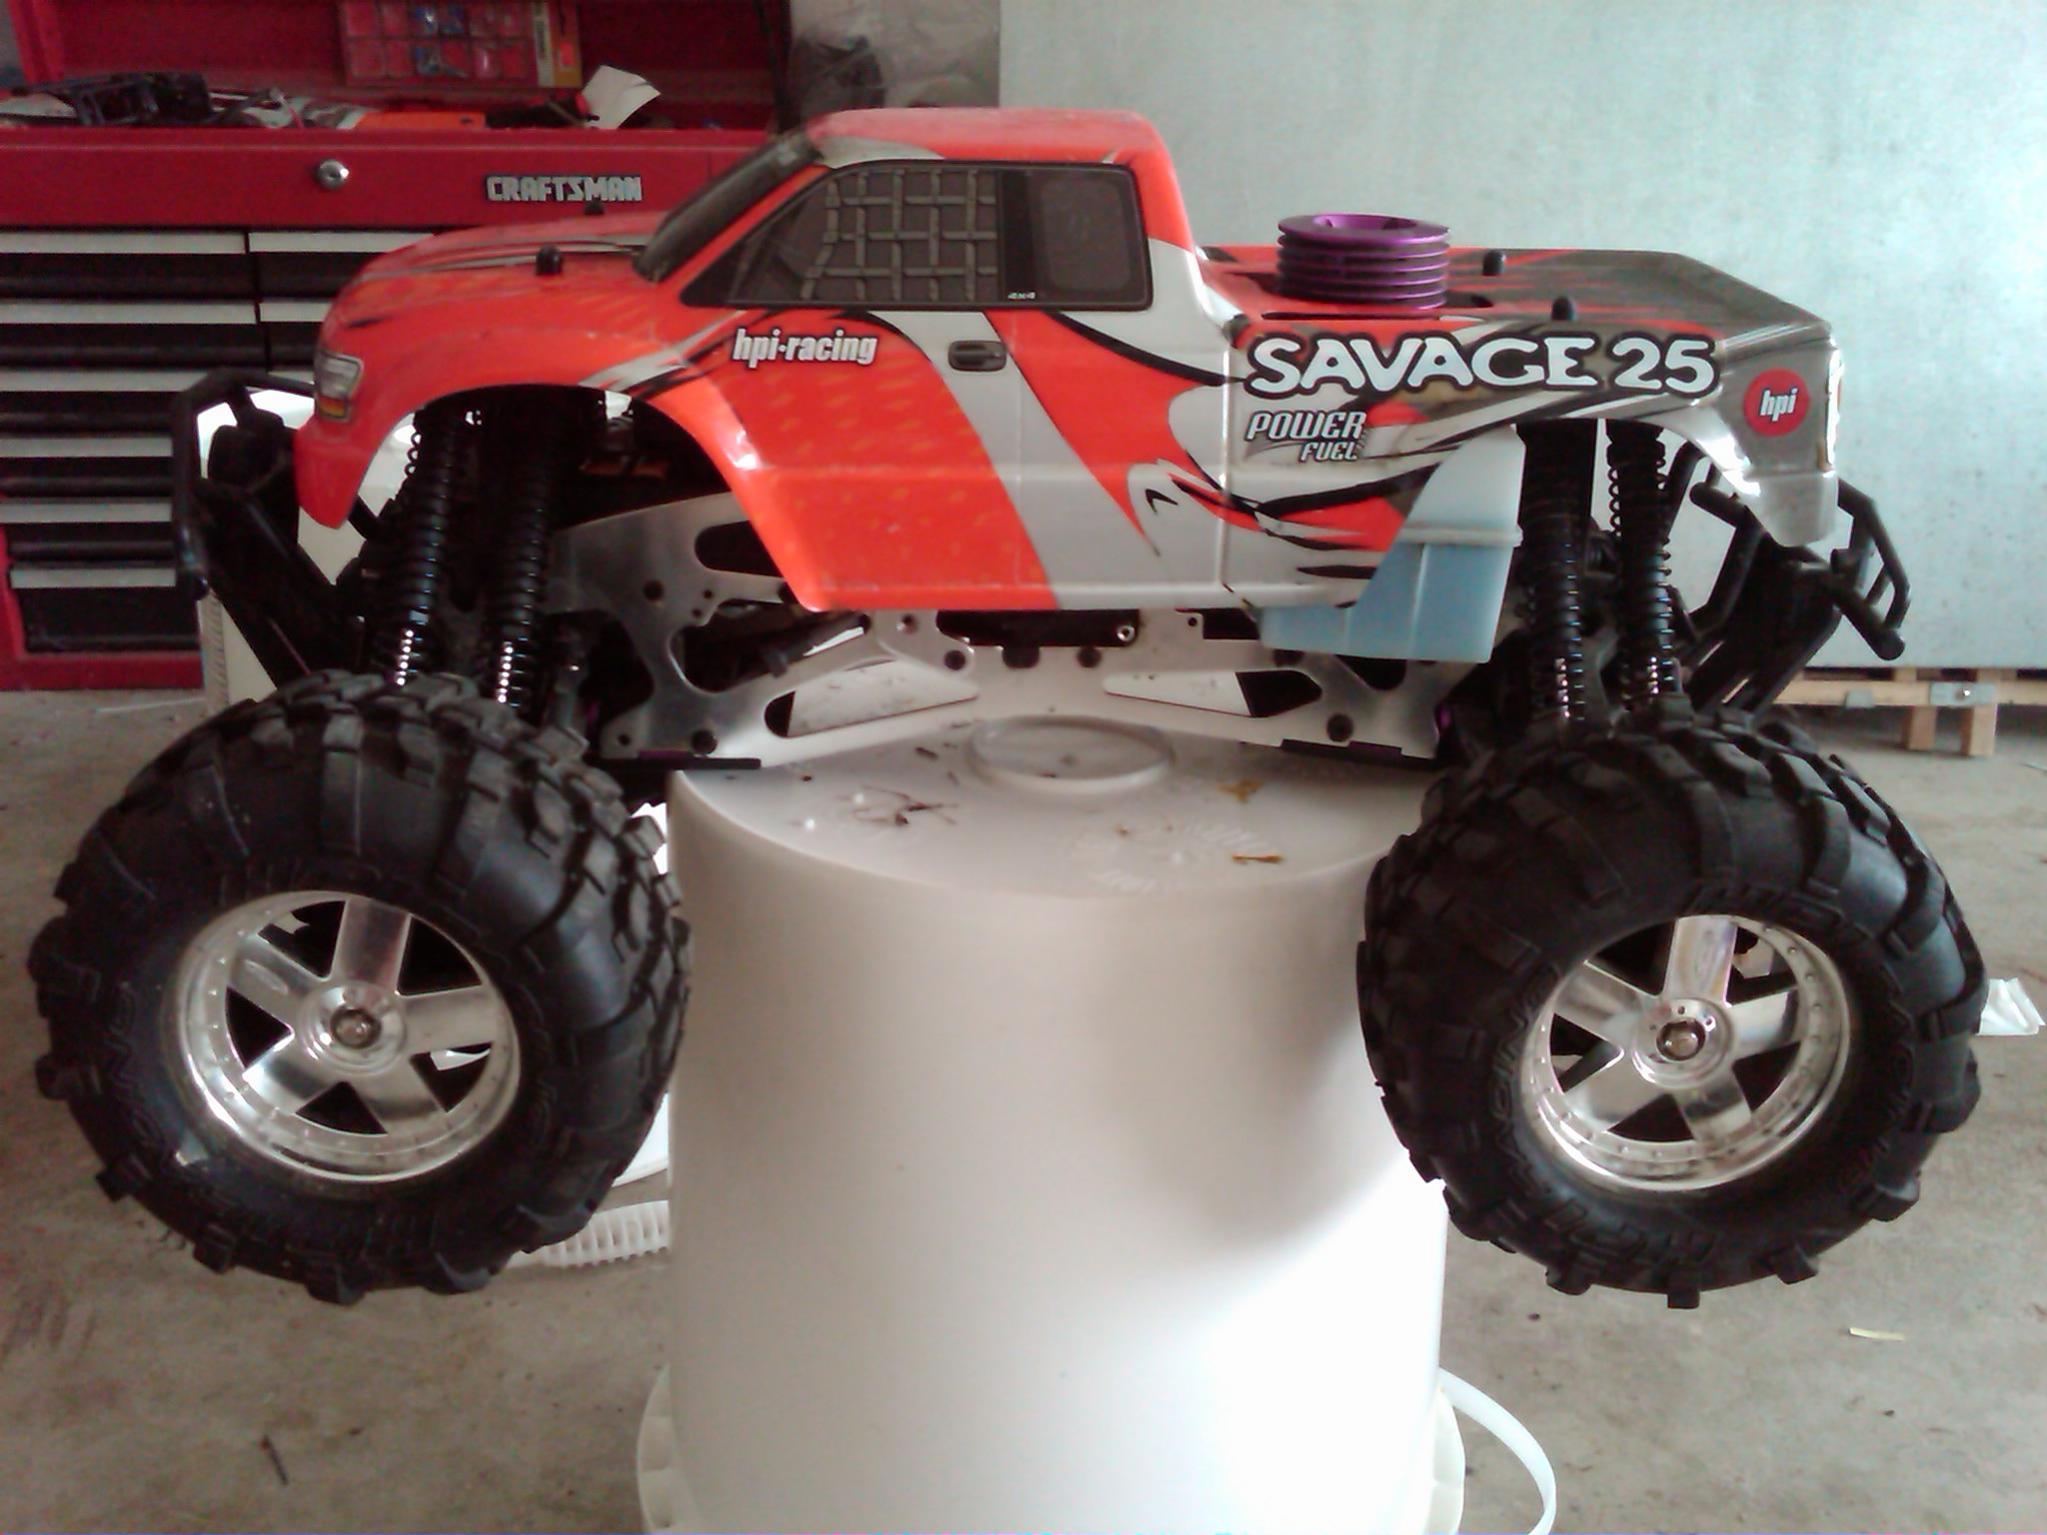 hpi savage 25 parts diagram all diagram schematics hpi savage ss hpi racing savage 25 truck – rtr